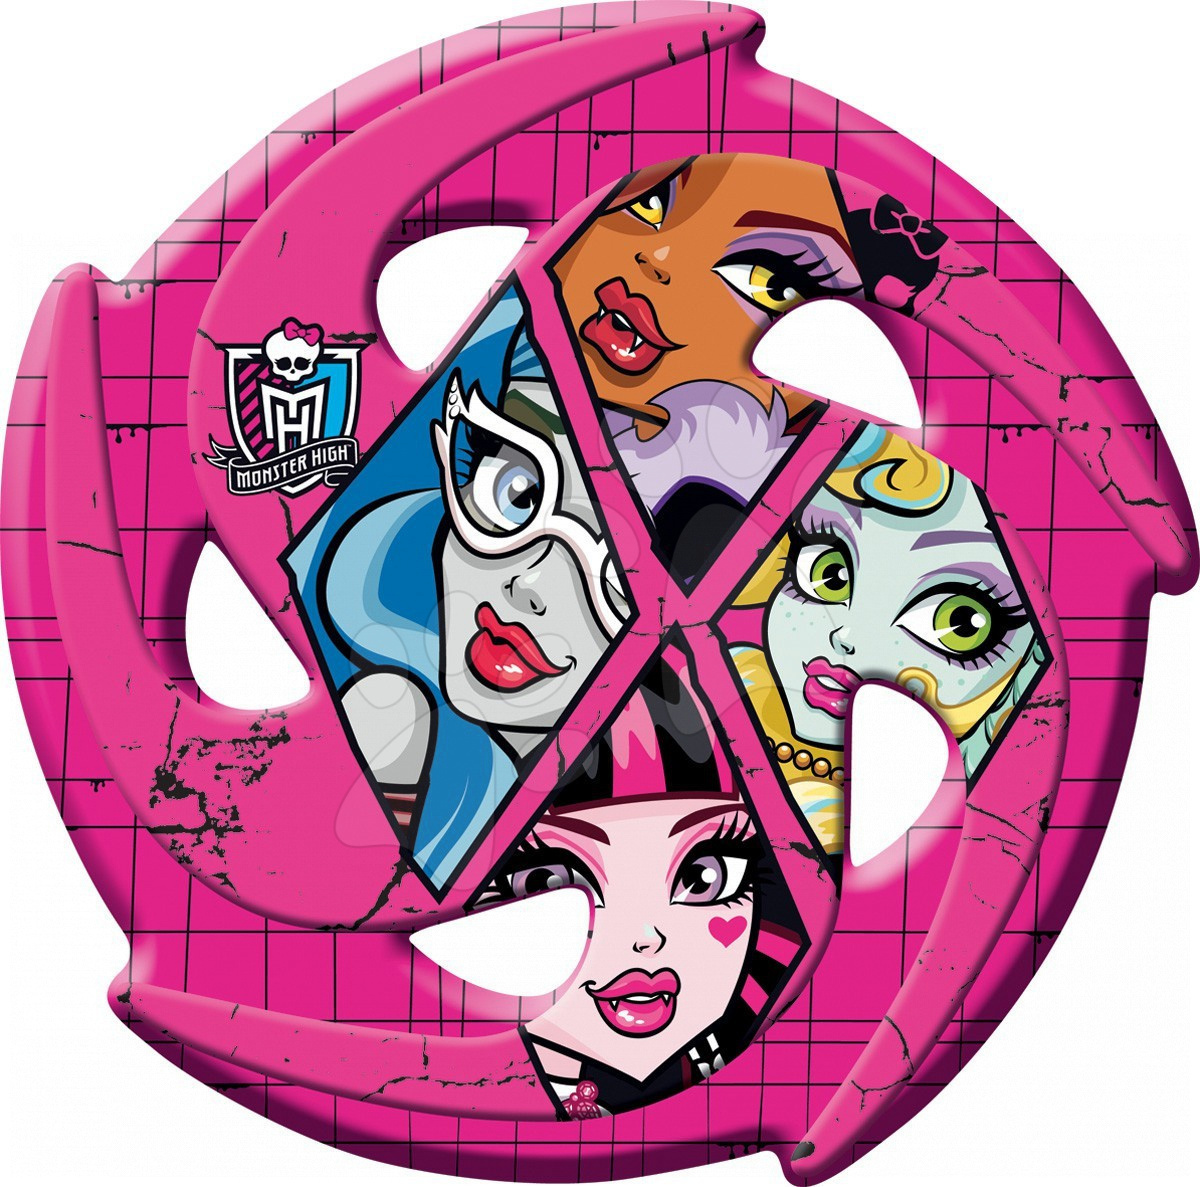 Lietajúci tanier Monster High Mondo priemer 21 cm